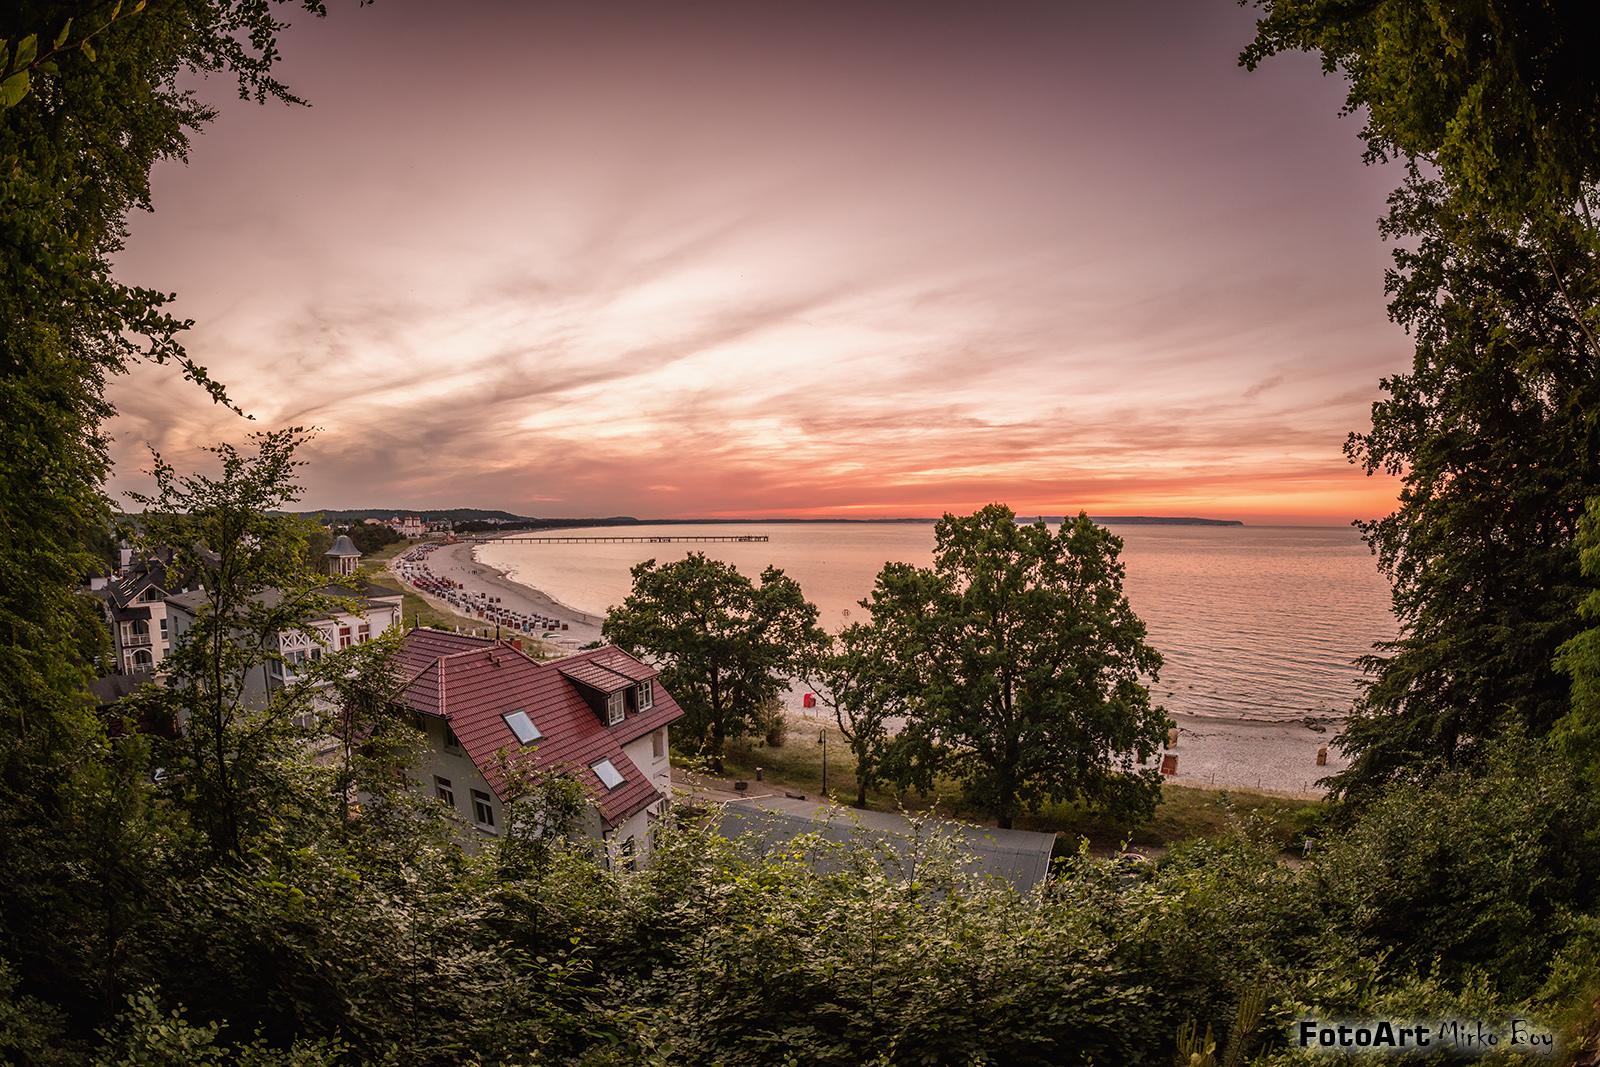 Binzblick Sonnenuntergang - Fototouren